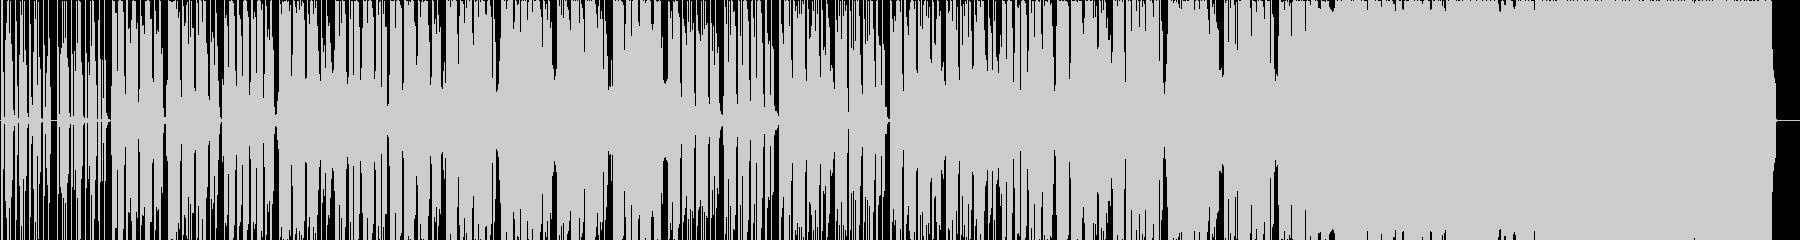 ISLAND (Feat. MATTON)の未再生の波形